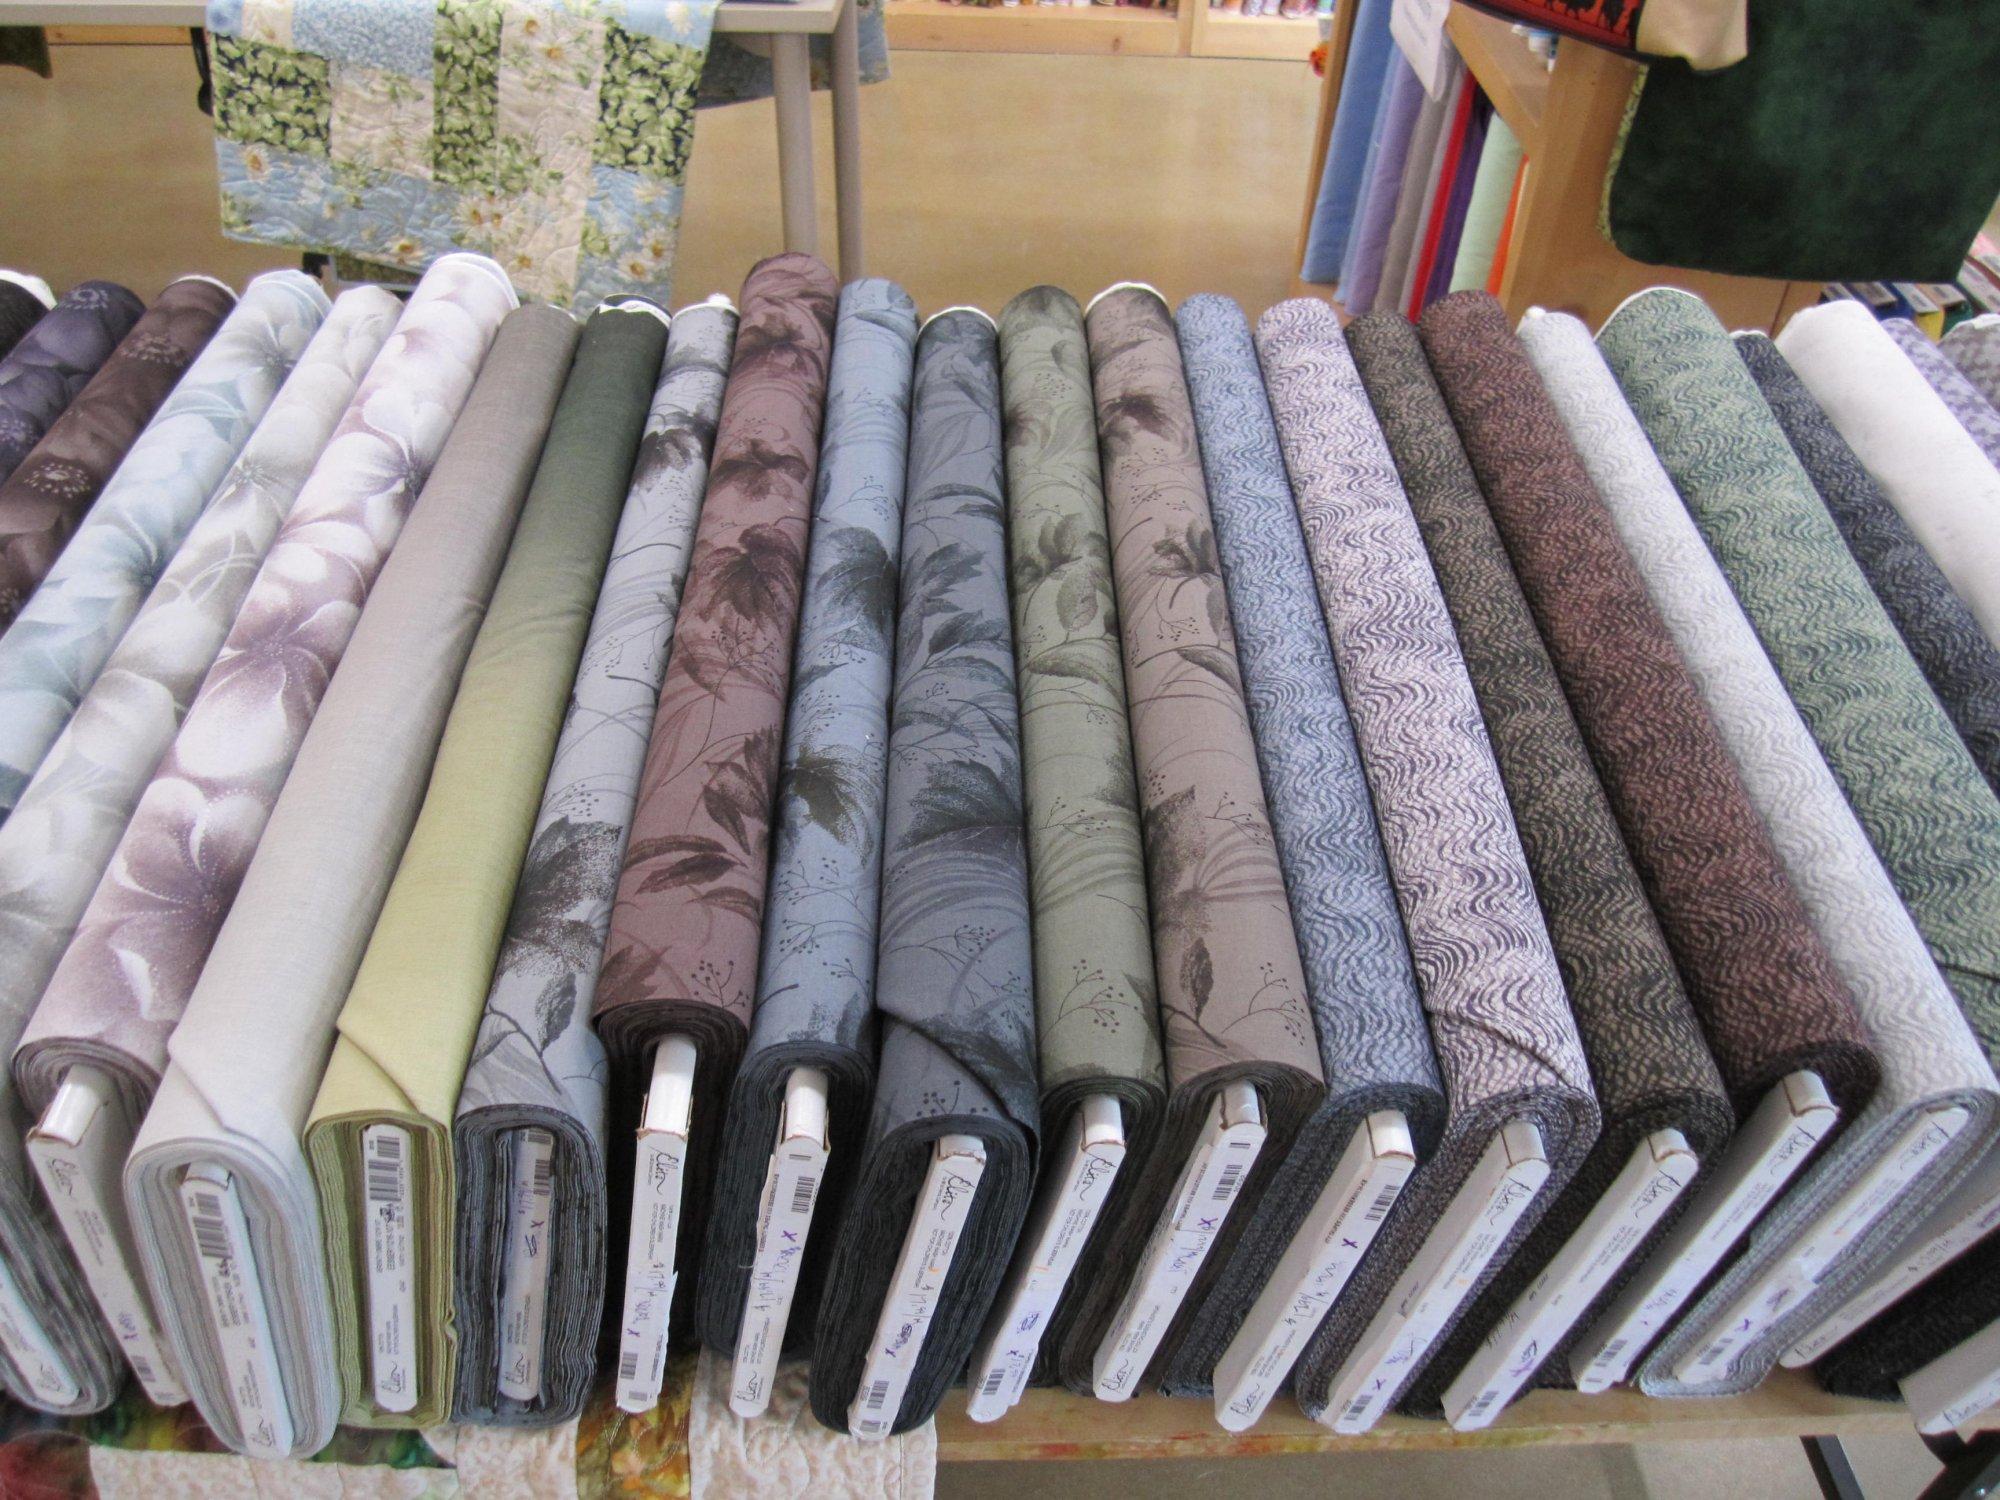 Tiger Lily Quilts   Wolseley, Saskatchewan, Canada   Online Quilt Shop : online quilt stores canada - Adamdwight.com